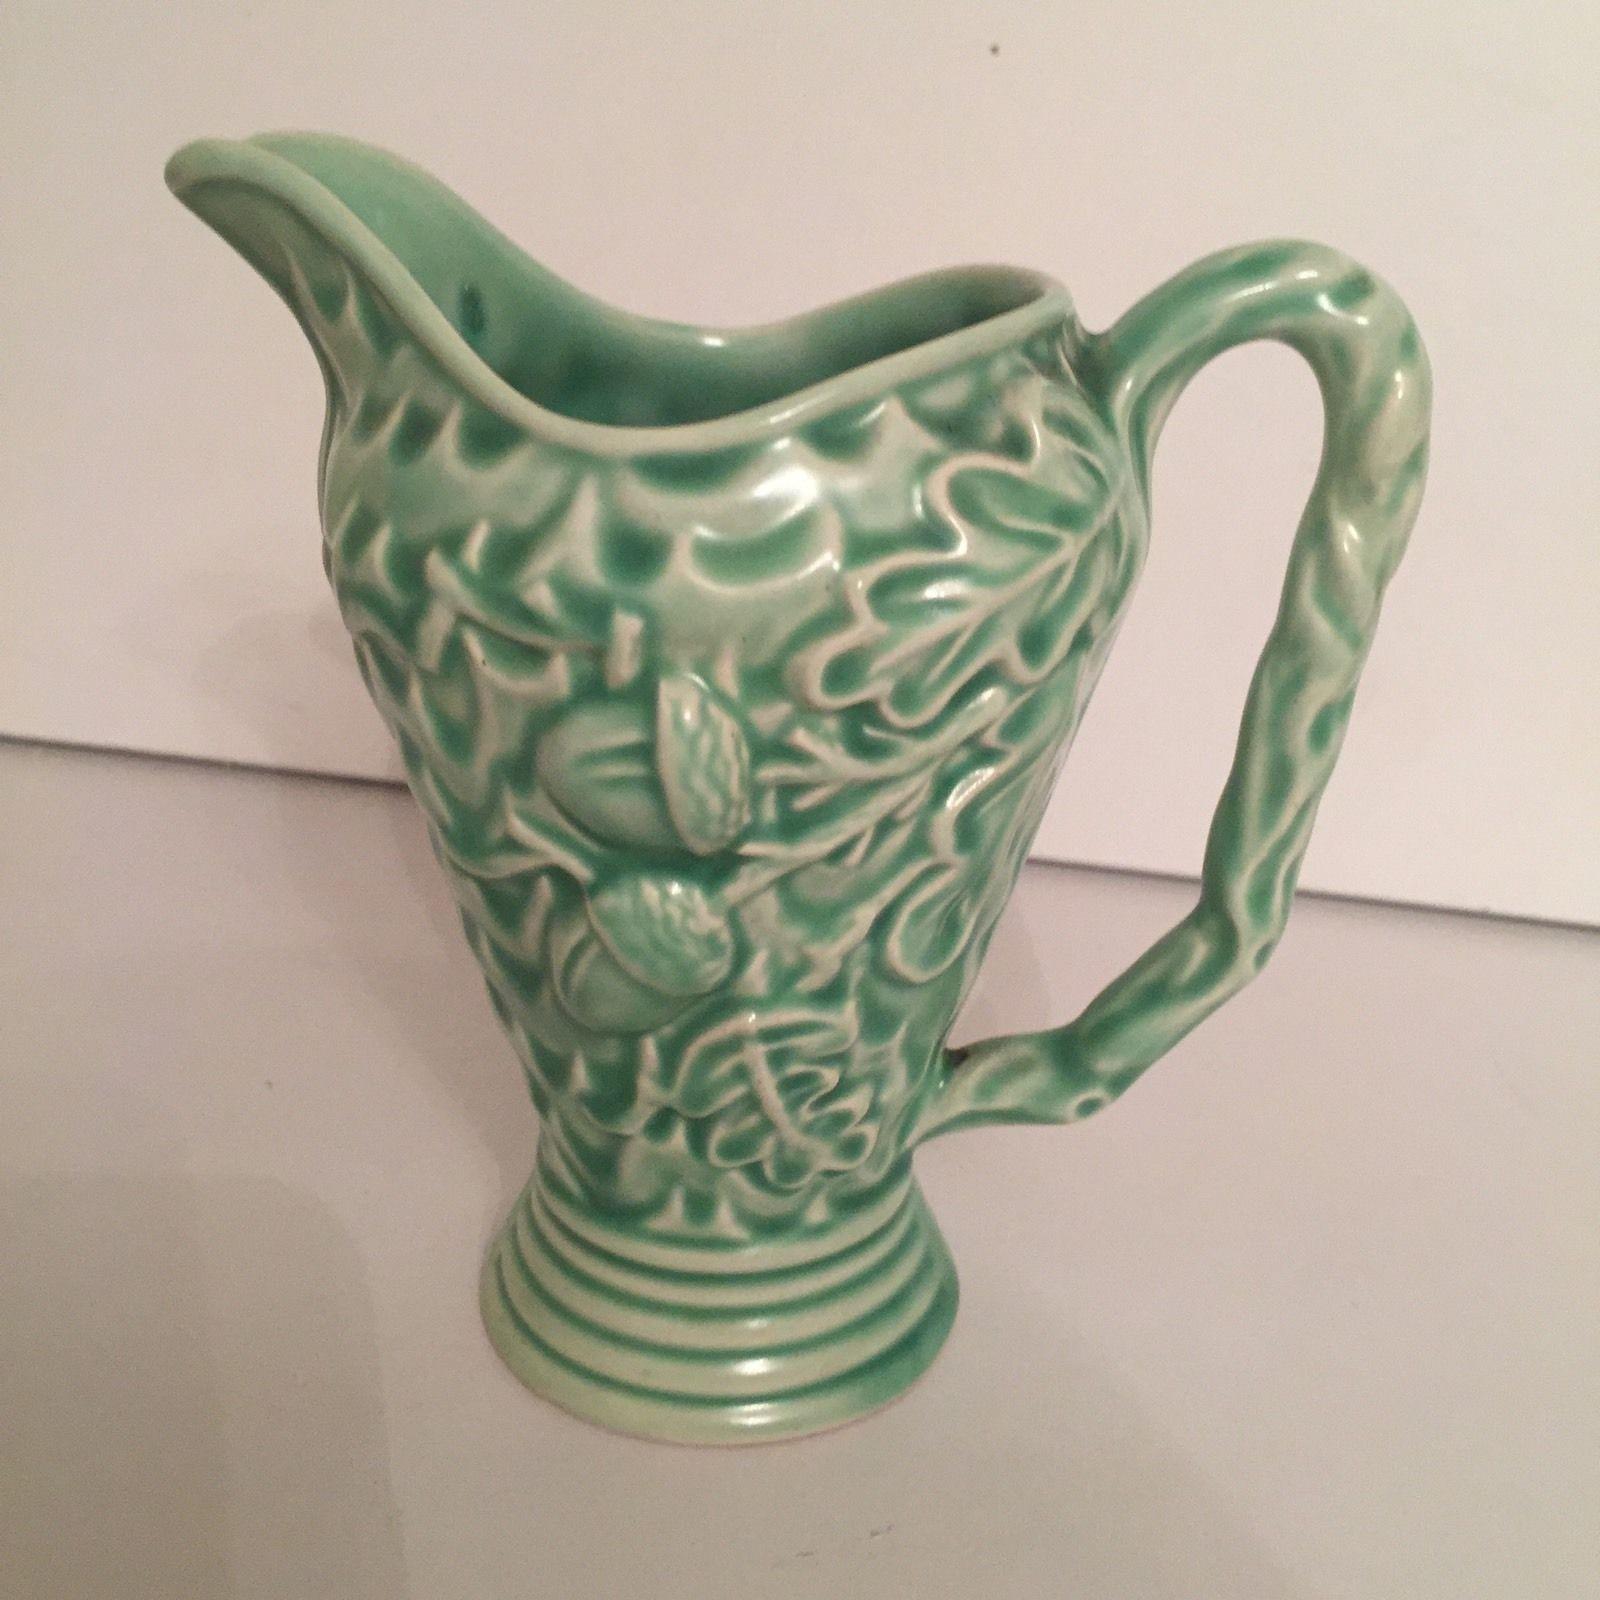 Decorative Jugs And Vases Vintage Wade Art Deco Acorn Oak Jug Pitcher Vase In Pottery